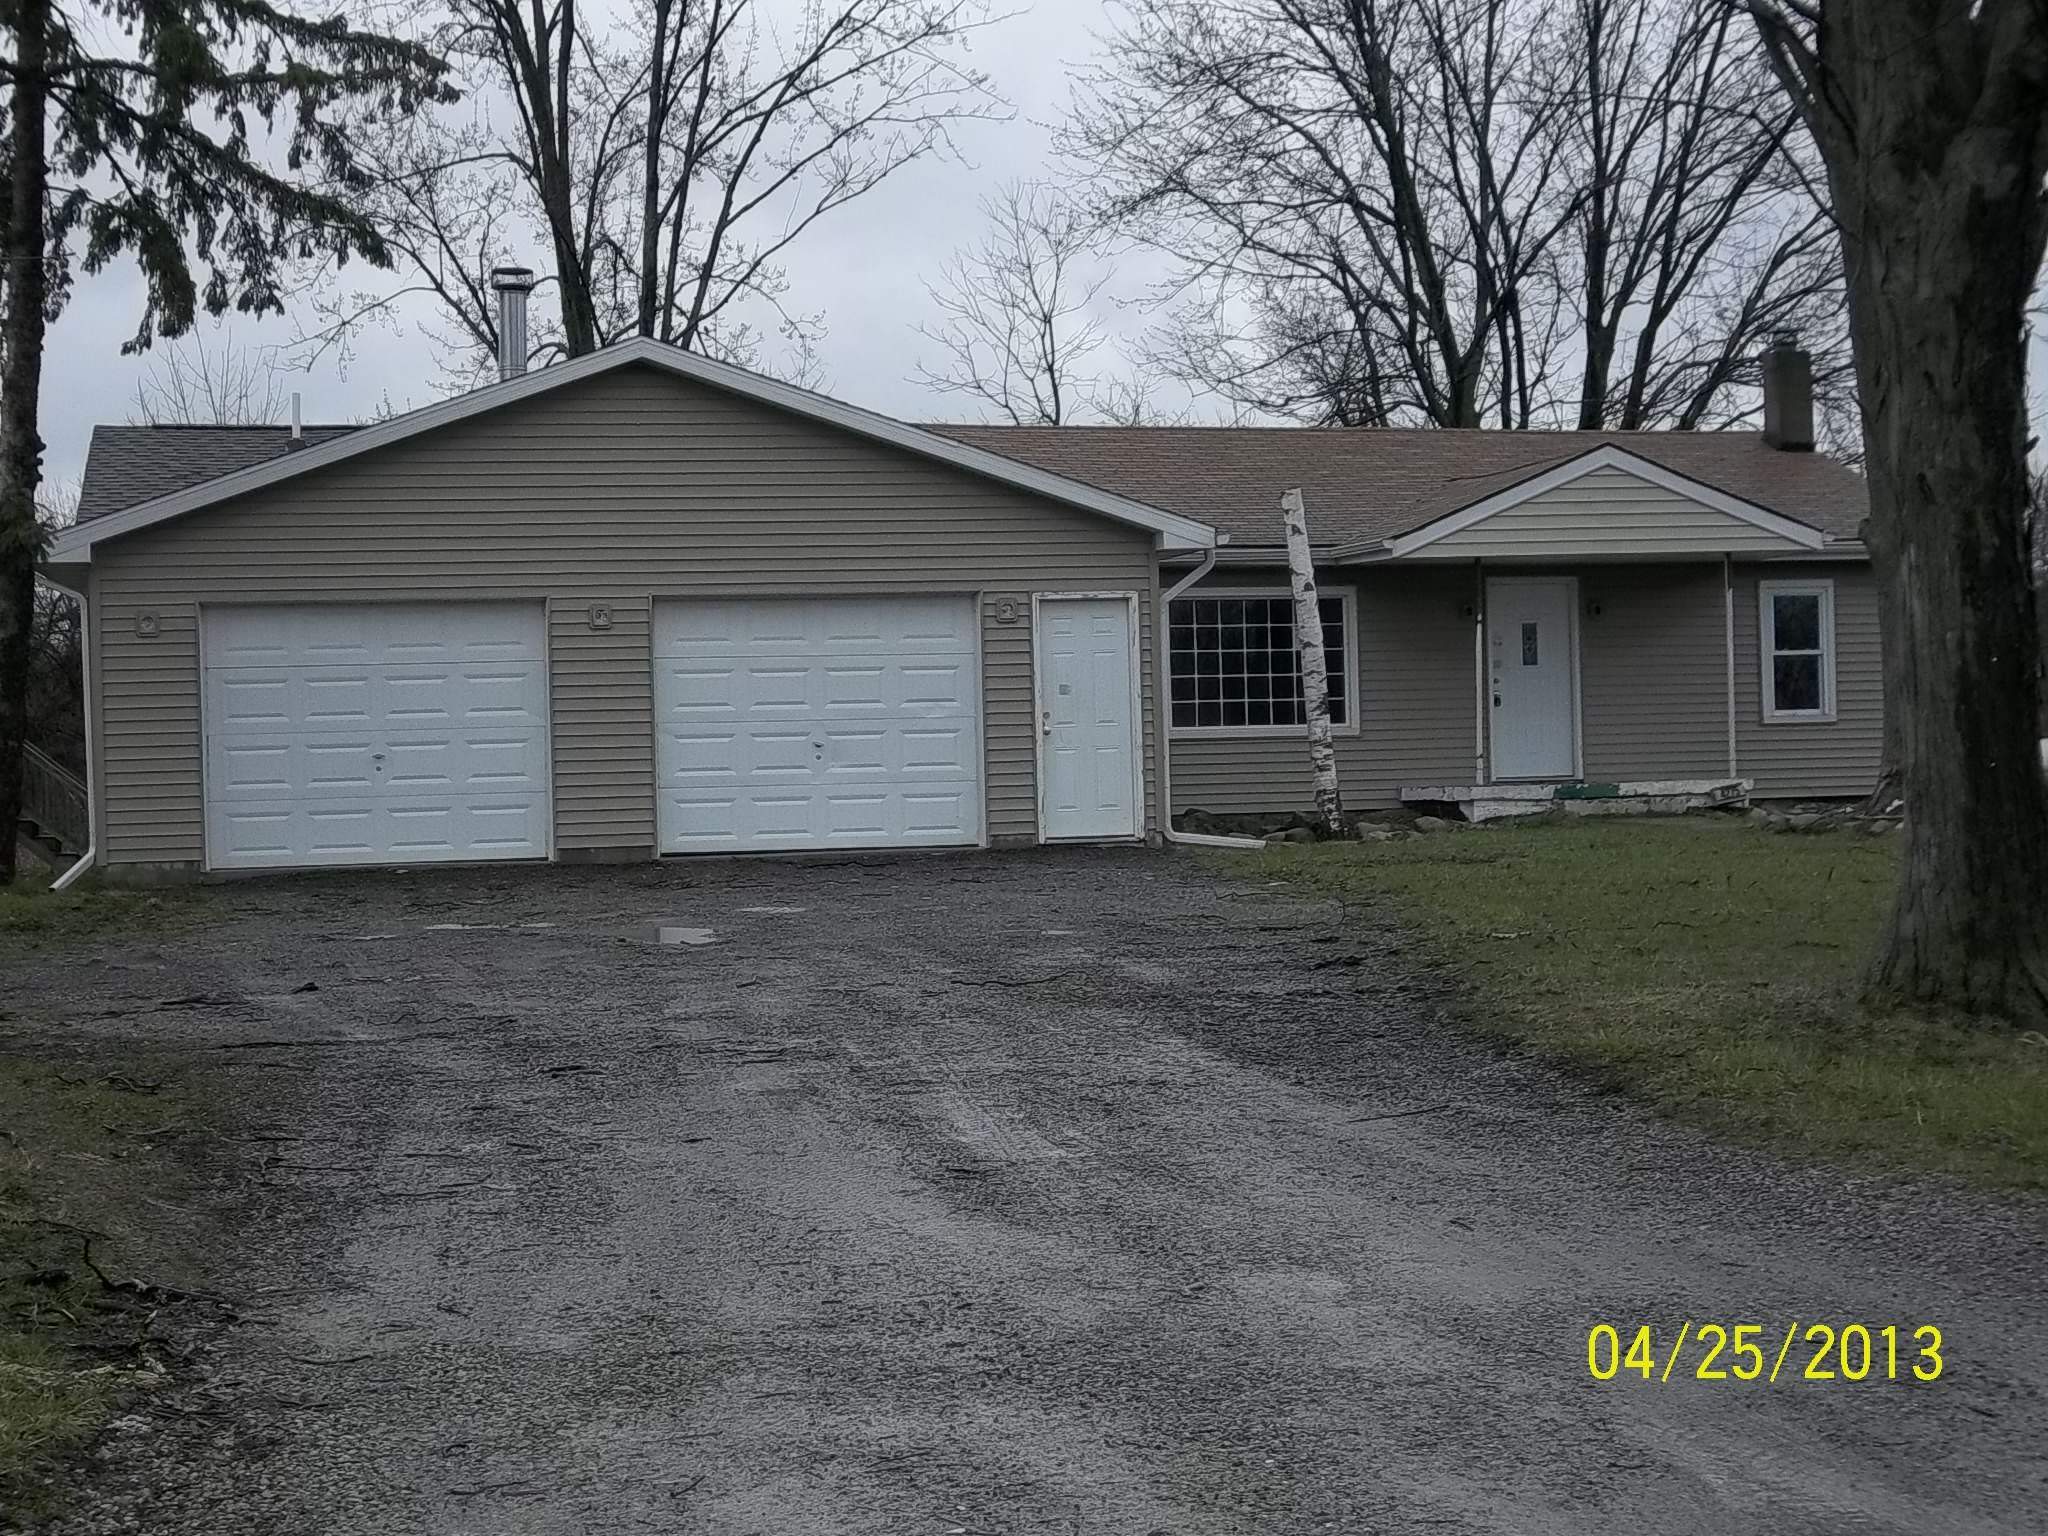 4275 south henderson road davison mi 48423 for sale